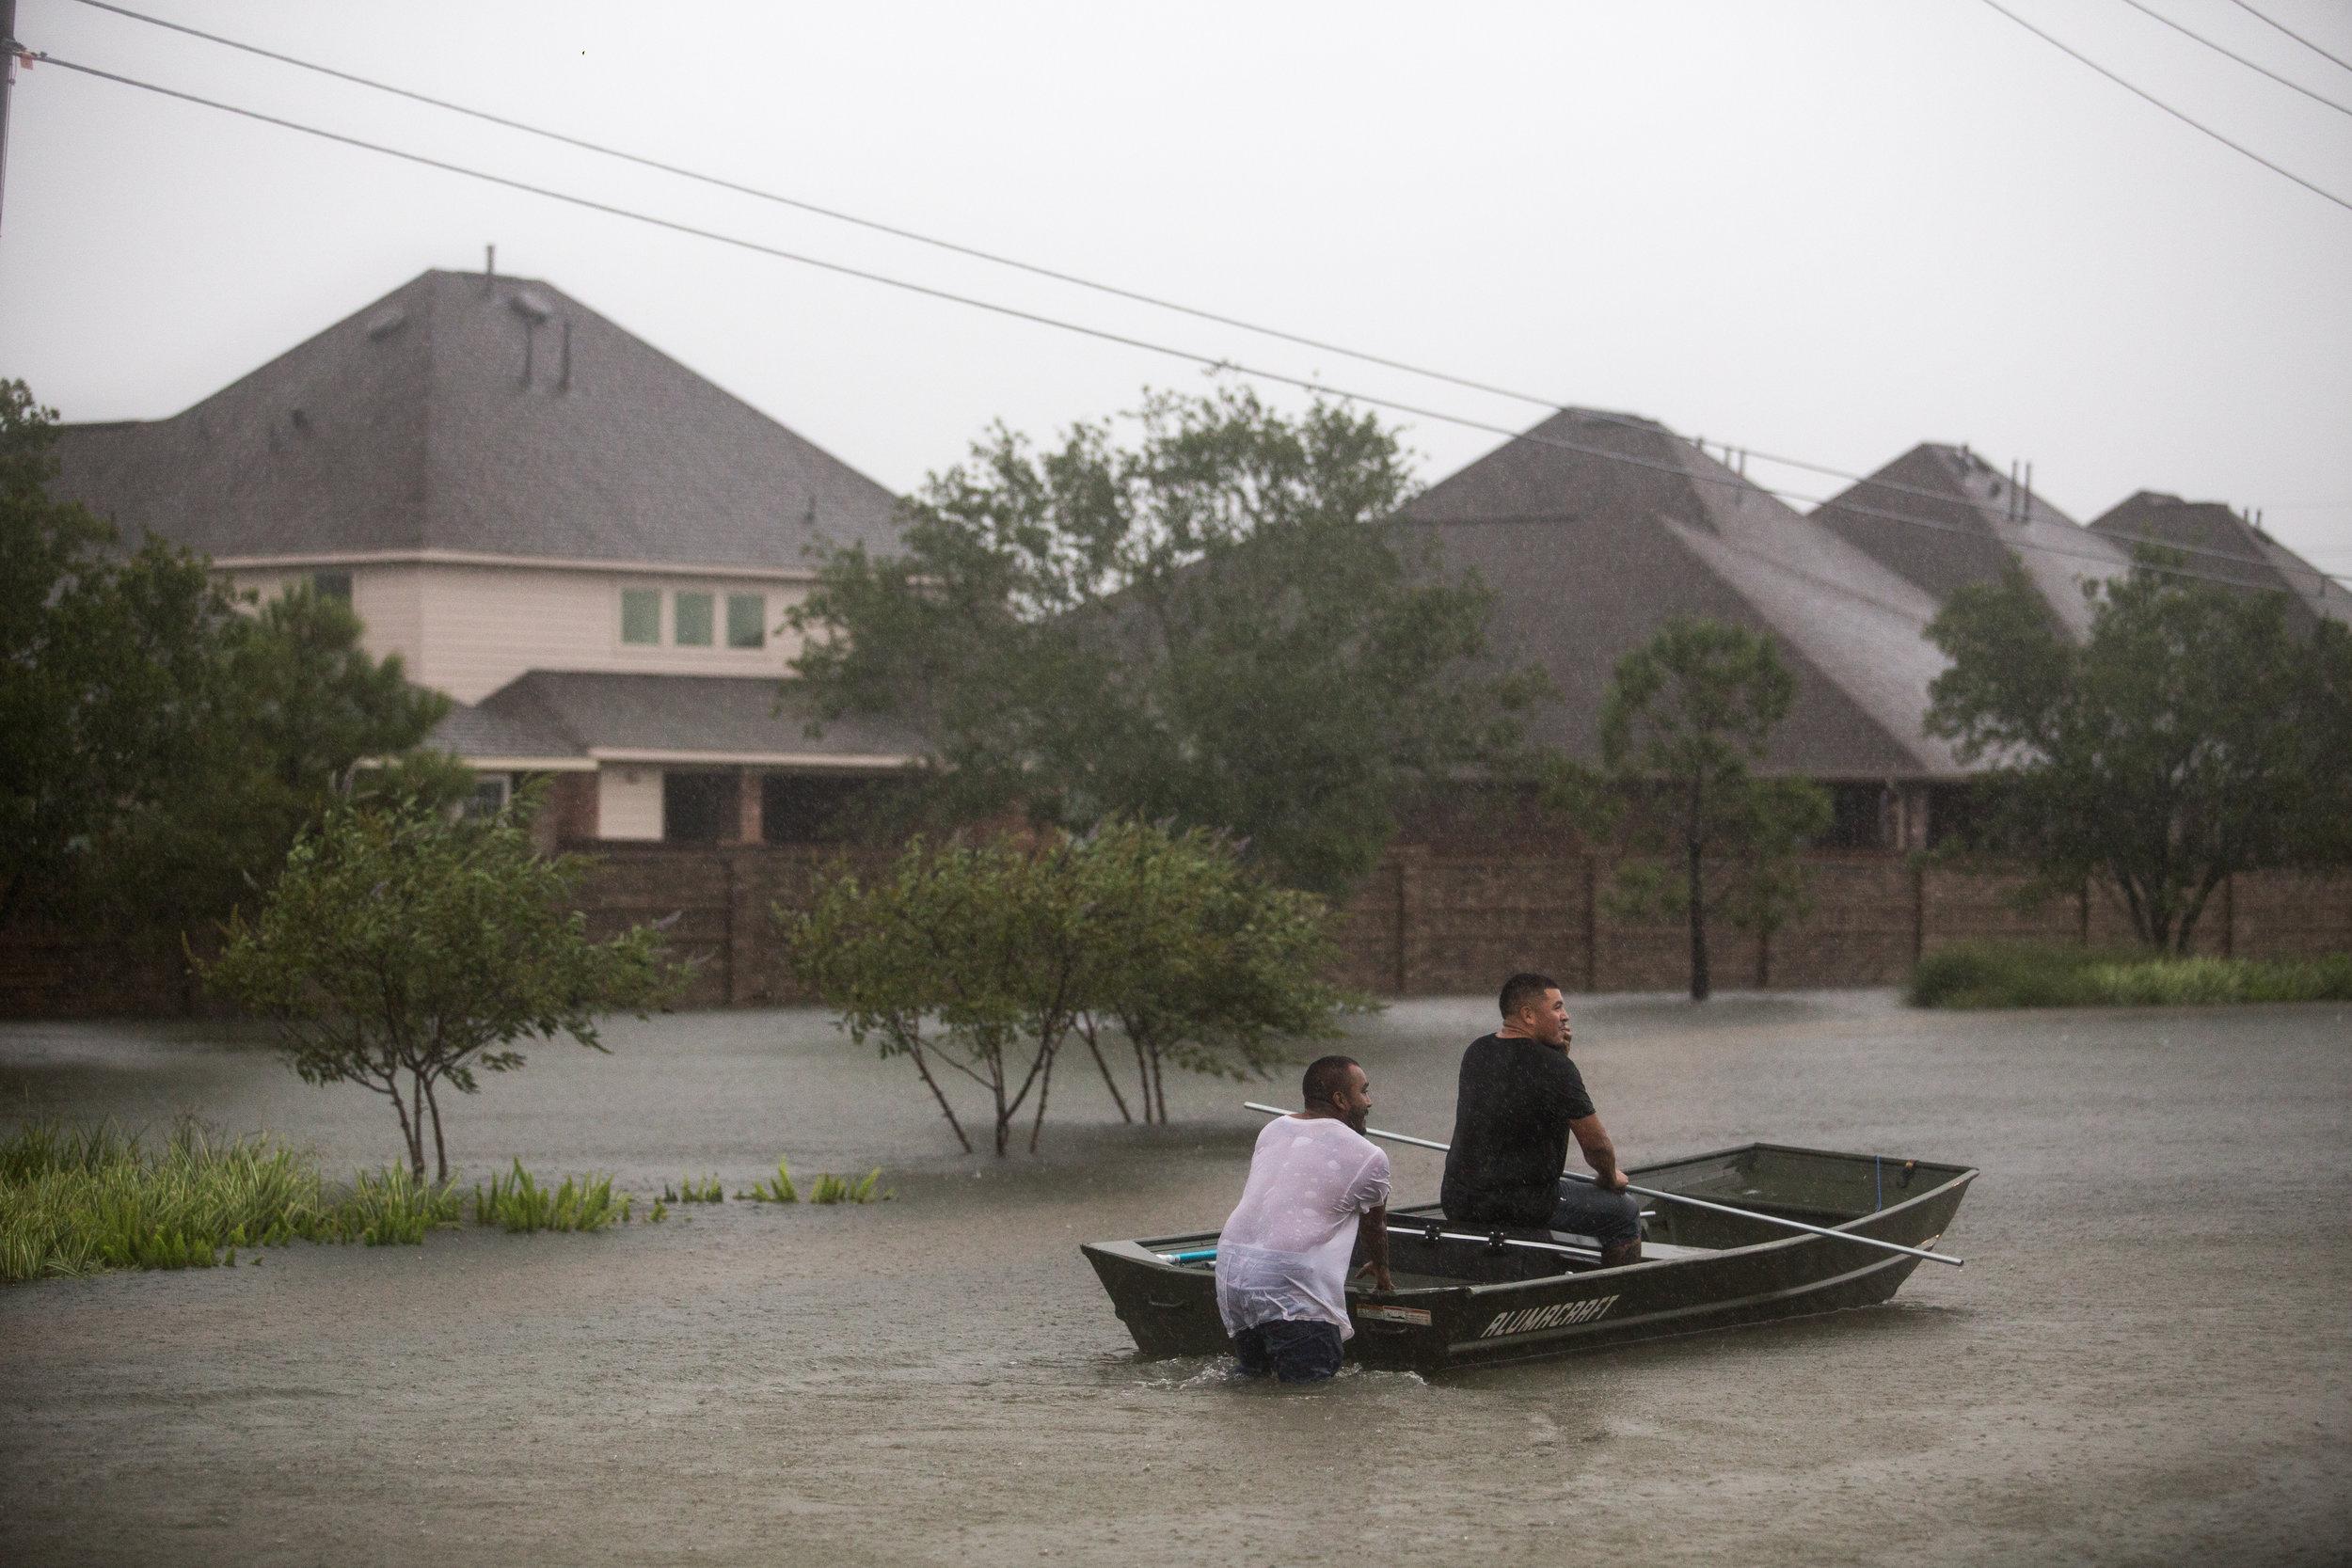 2017-08-28_Hurricane_Harvey_Harlem_Boat_Pu.Ying.Huang0037.jpg